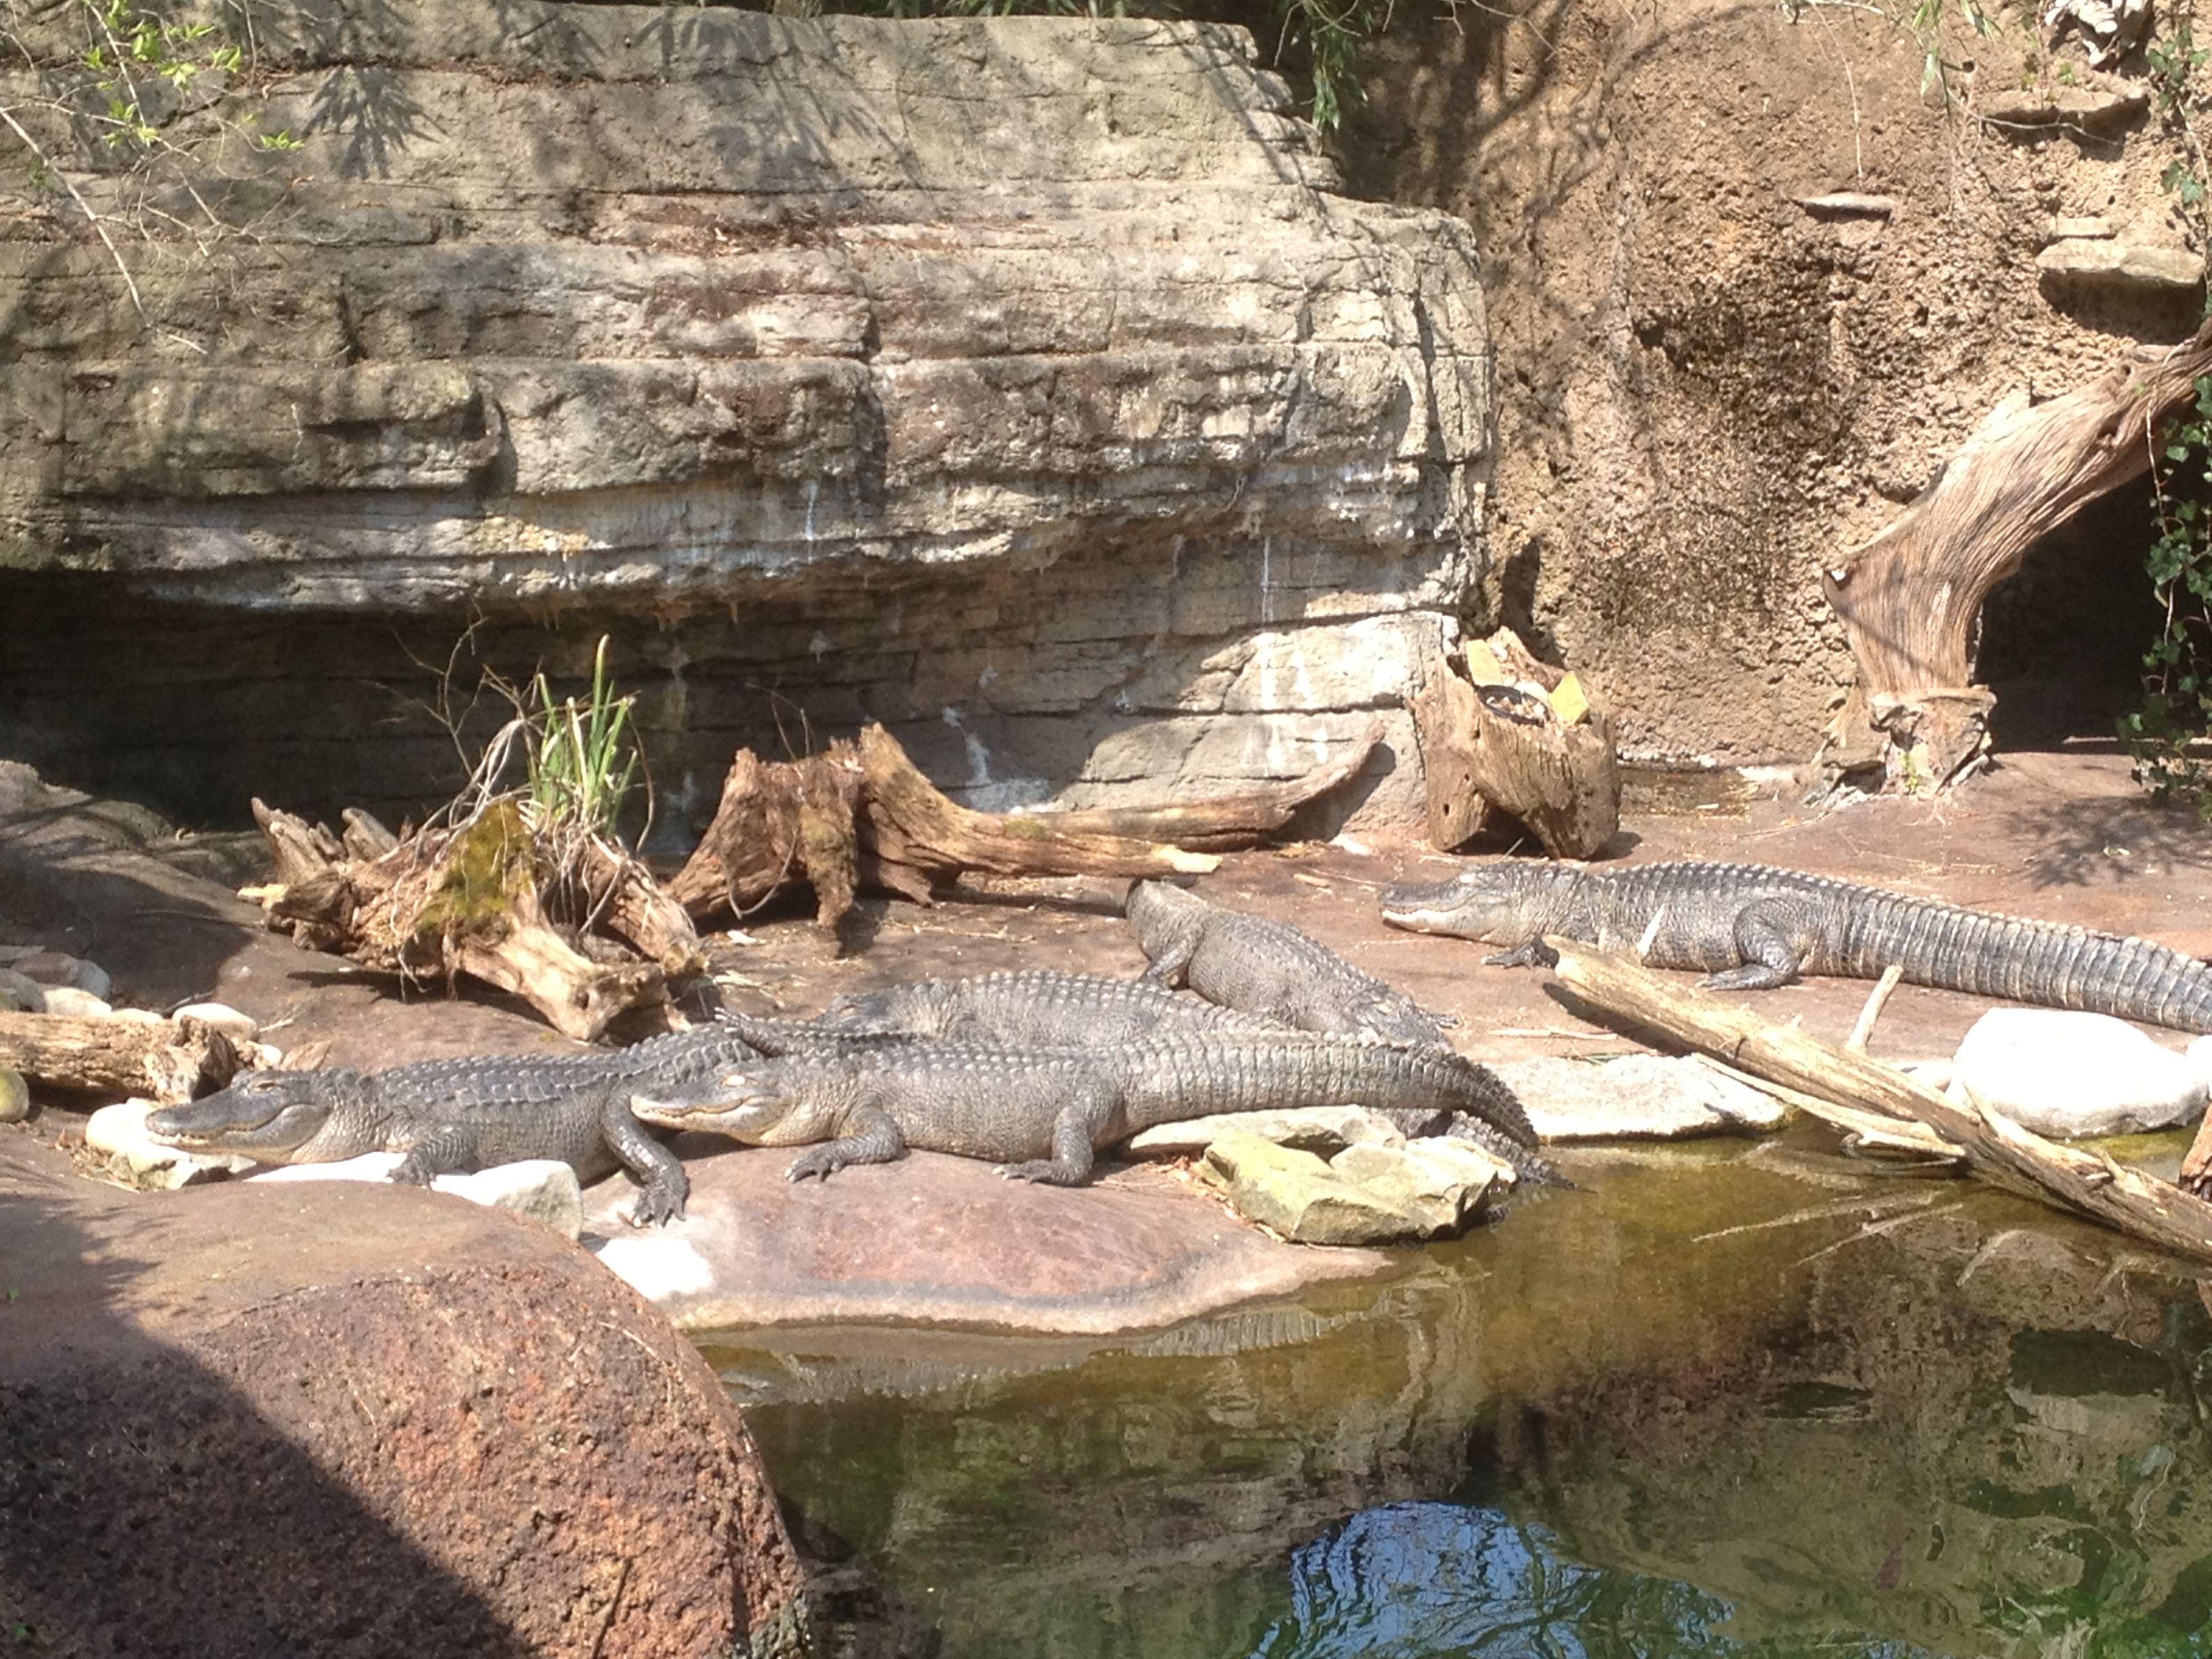 Alligators at Nashville Zoo